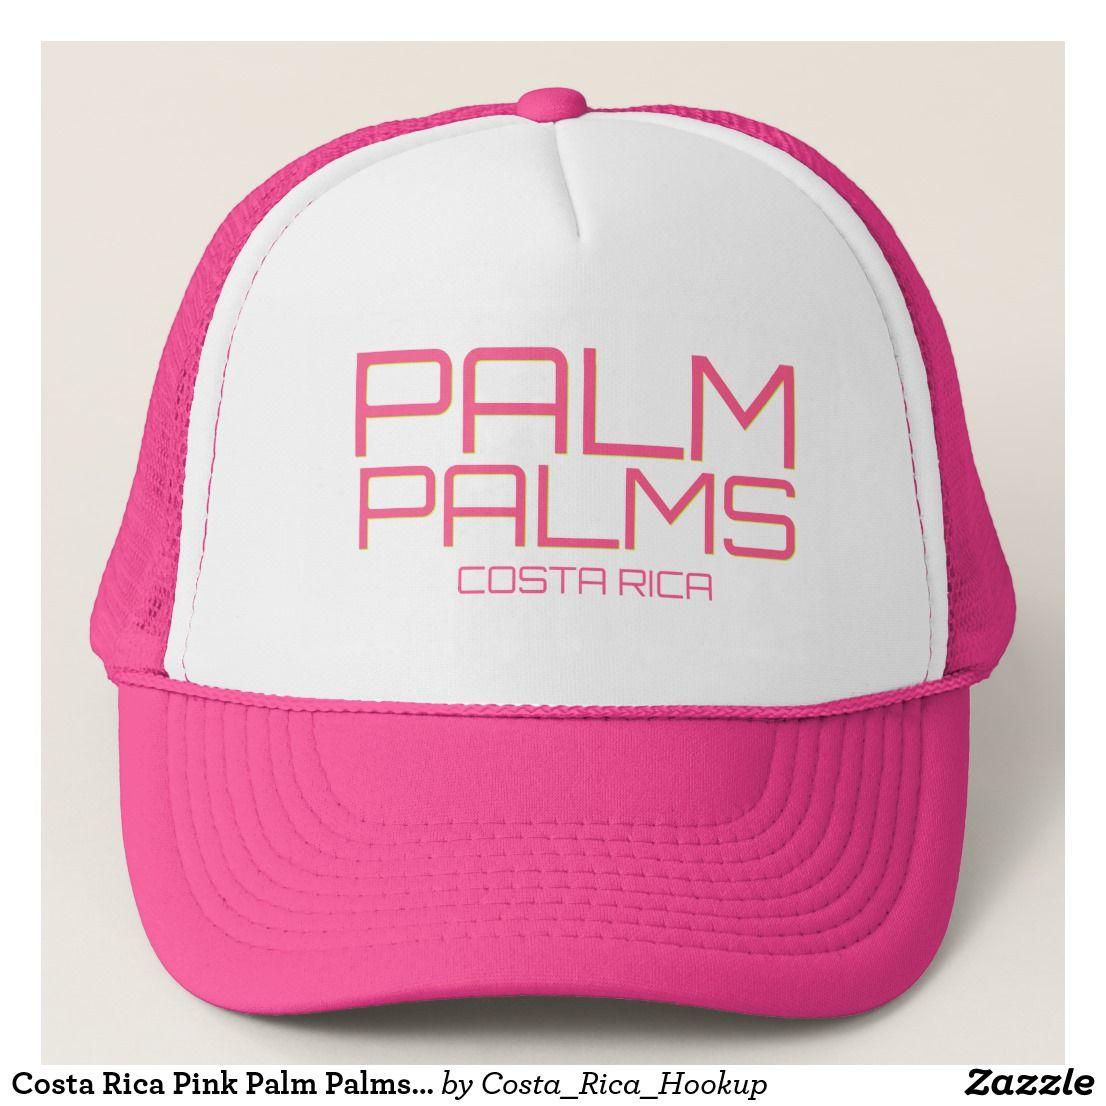 Costa Rica Pink Palm Palms Beach Souvenir Trucker Hat  c89ca85b02f4